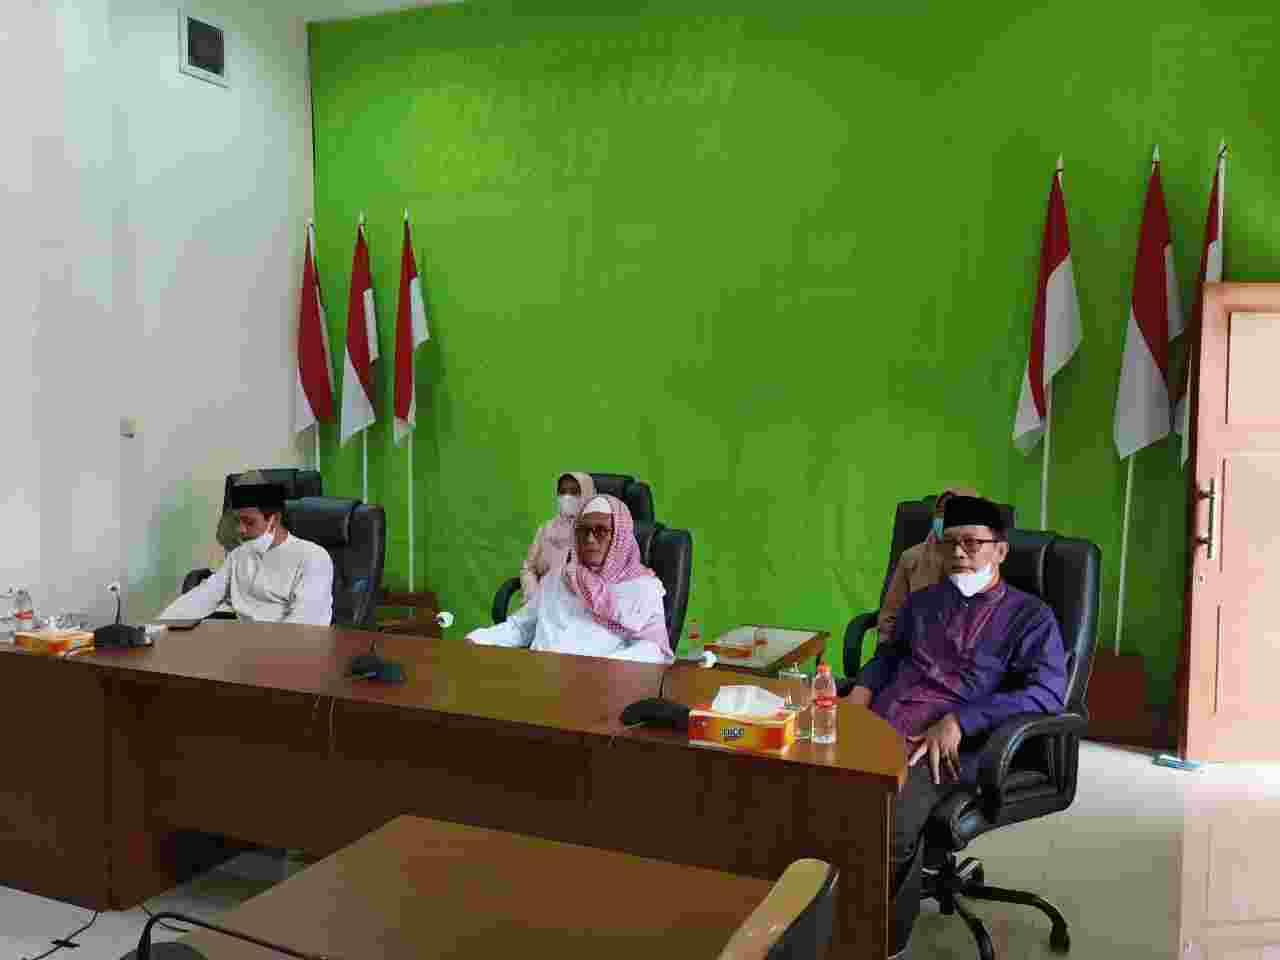 Bahas Kasus Covid-19 Jawa Barat dalam Vidcon bersama Bupati Ciamis, Kamis (13/05/2021).